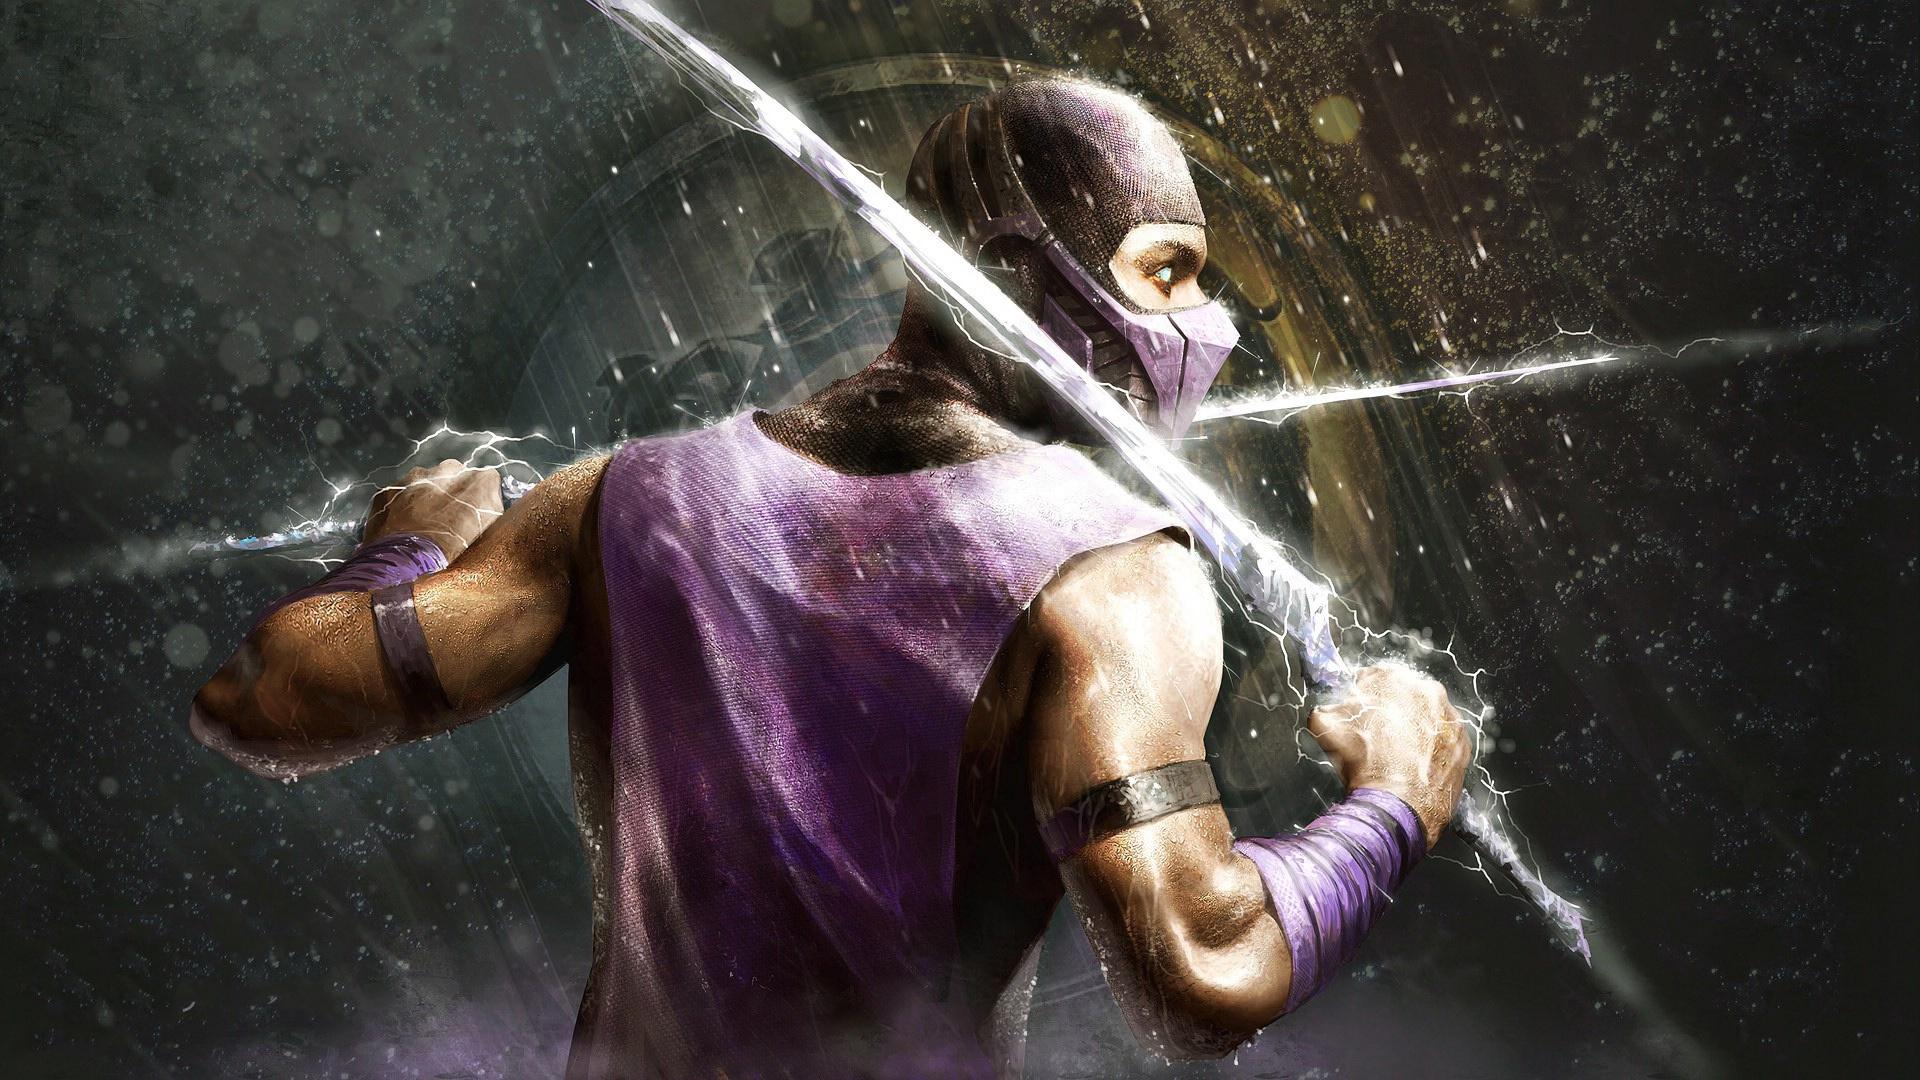 Rain in Mortal Kombat Exclusive HD Wallpapers 5616 1920x1080